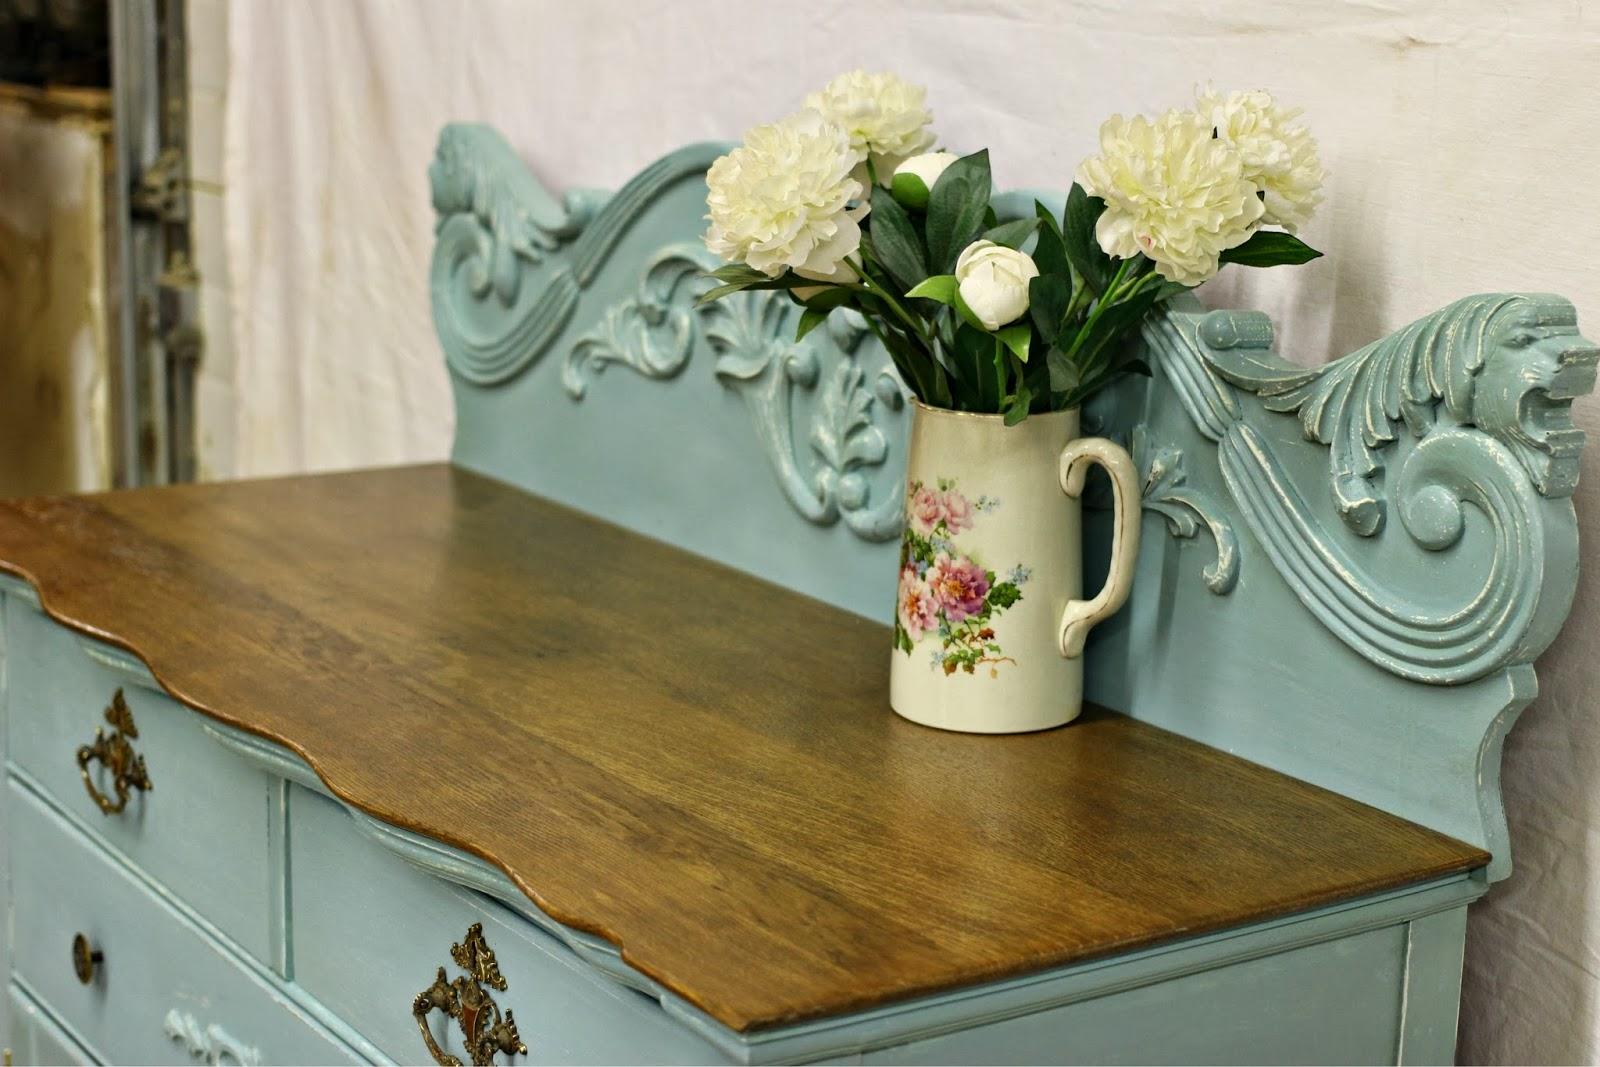 Flower vase kijiji -  On Kijiji Http Hamilton Kijiji Ca C Buy And Sell Furniture Hutches Display Cabinets Beautiful Antique Buffet Server Refinished W0qqadidz562884671